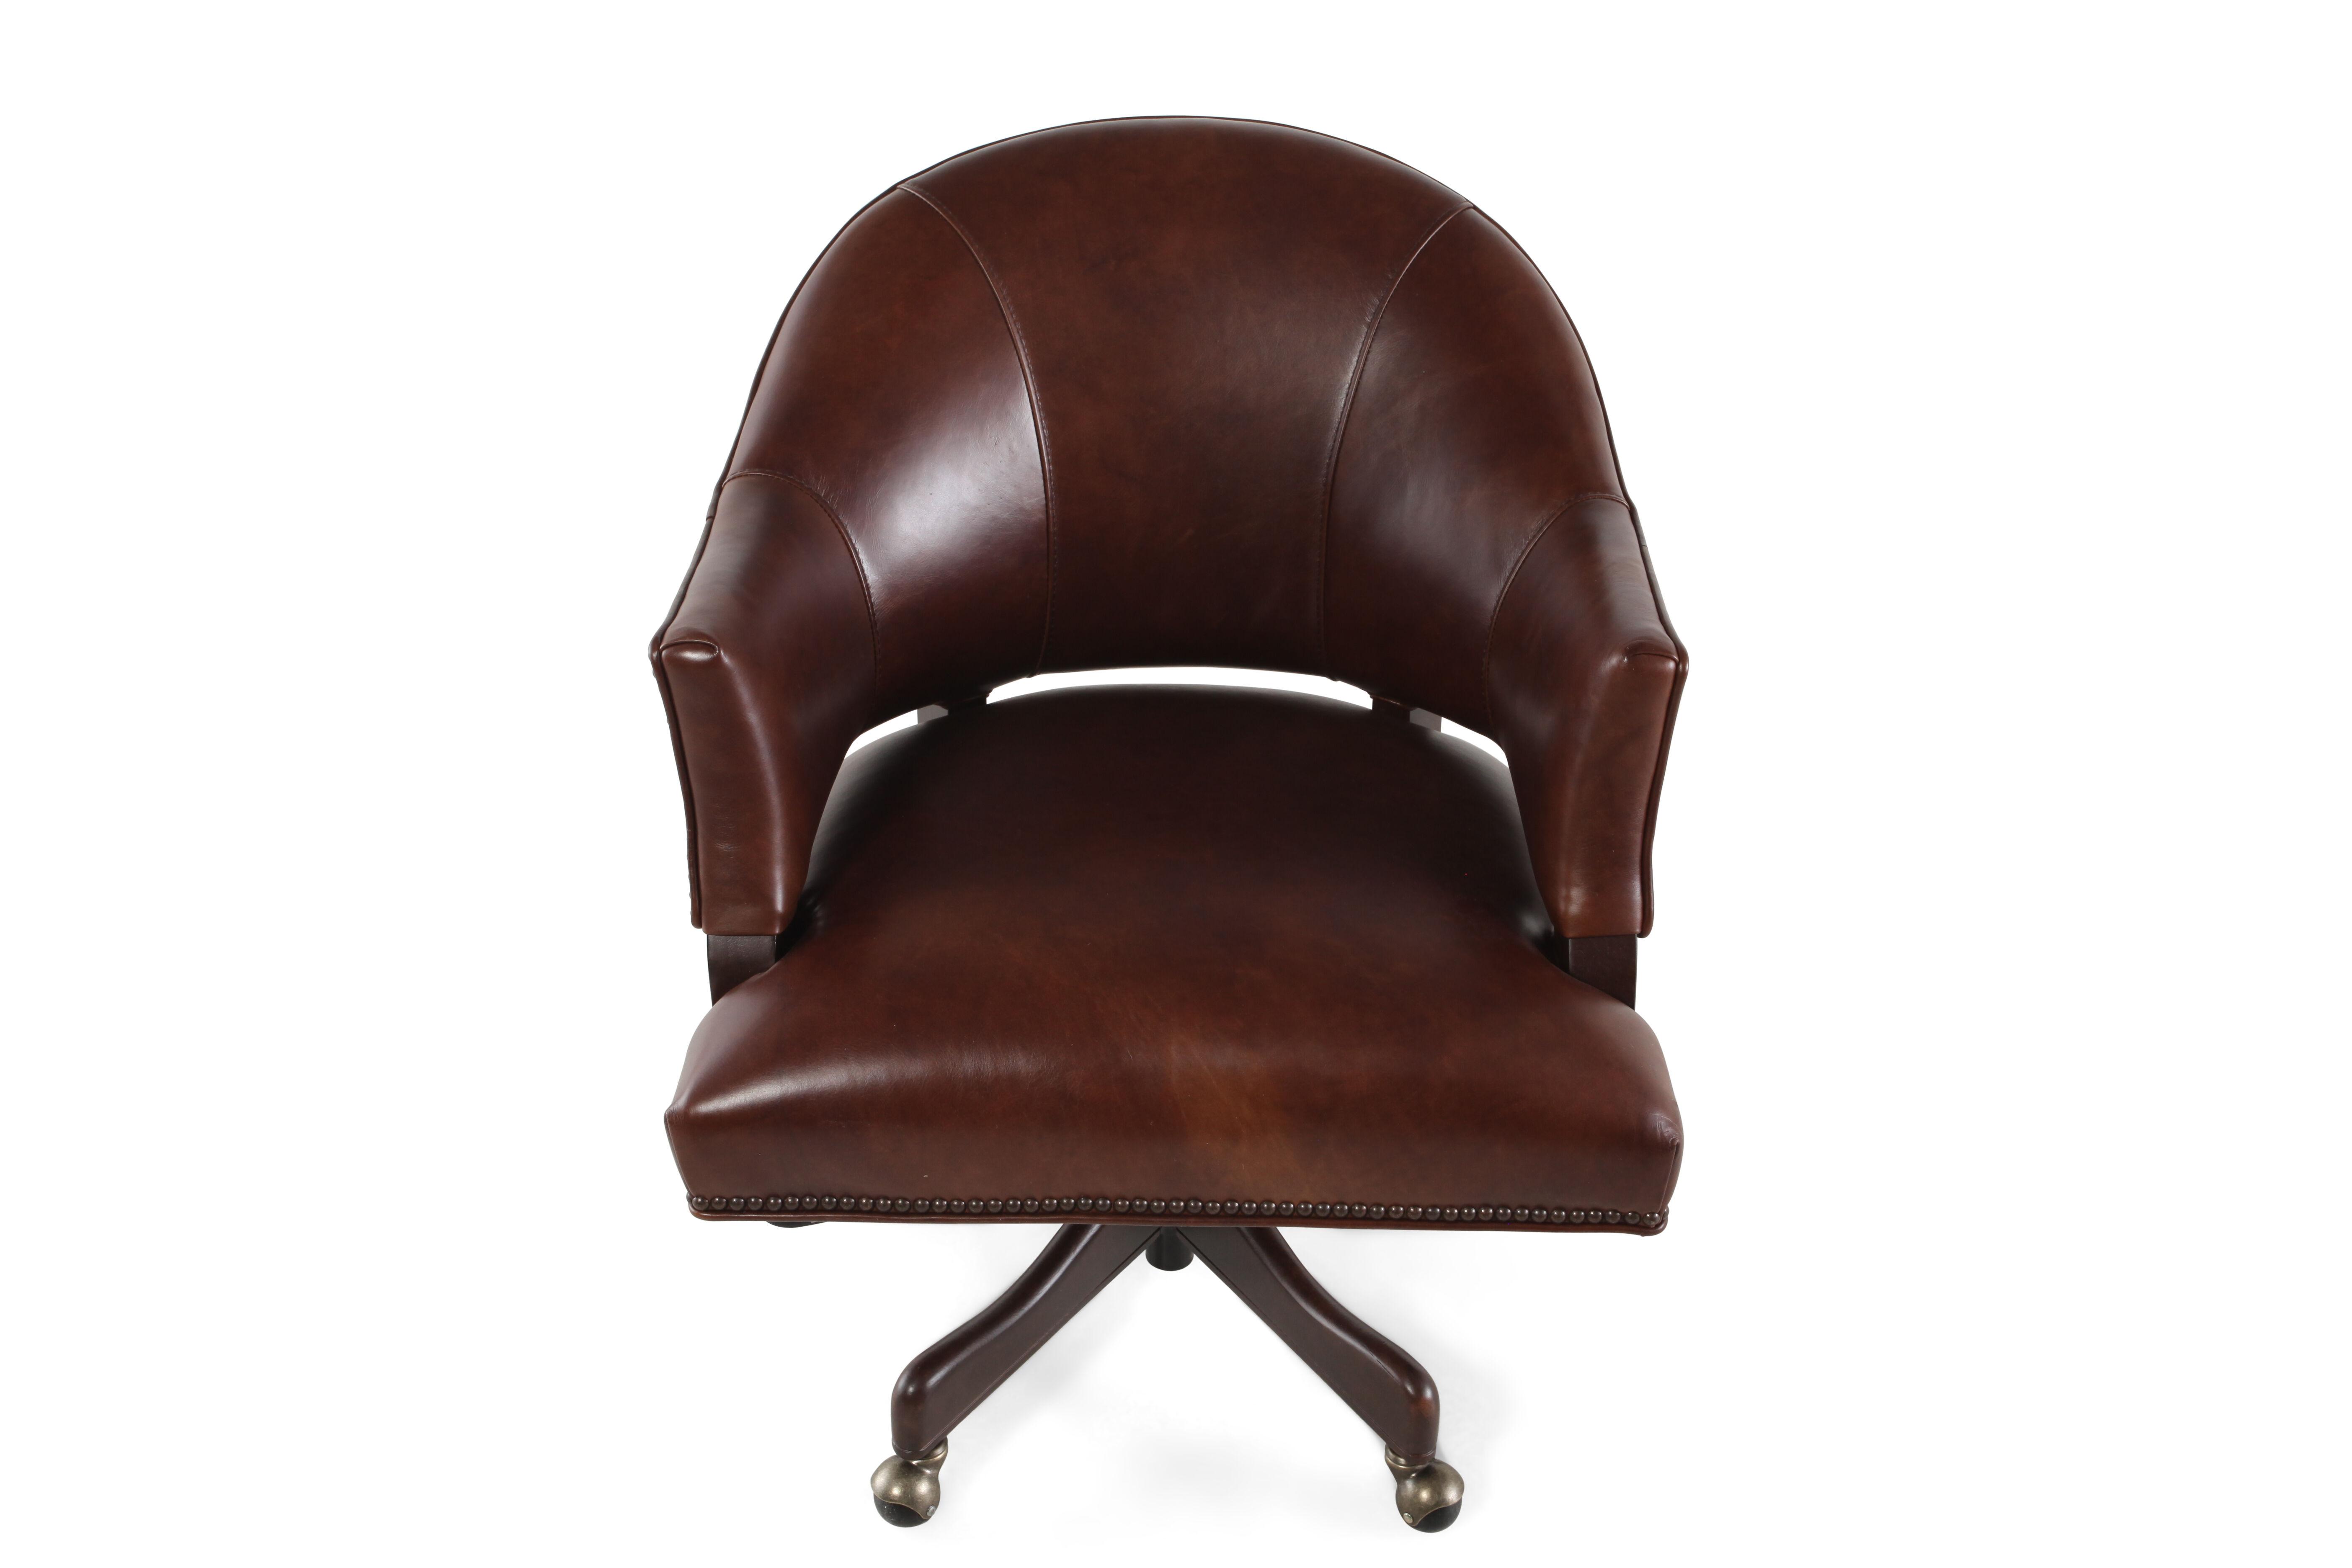 Padded Leather Swivel Tilt Office Chairu0026nbsp;in Dark Brown